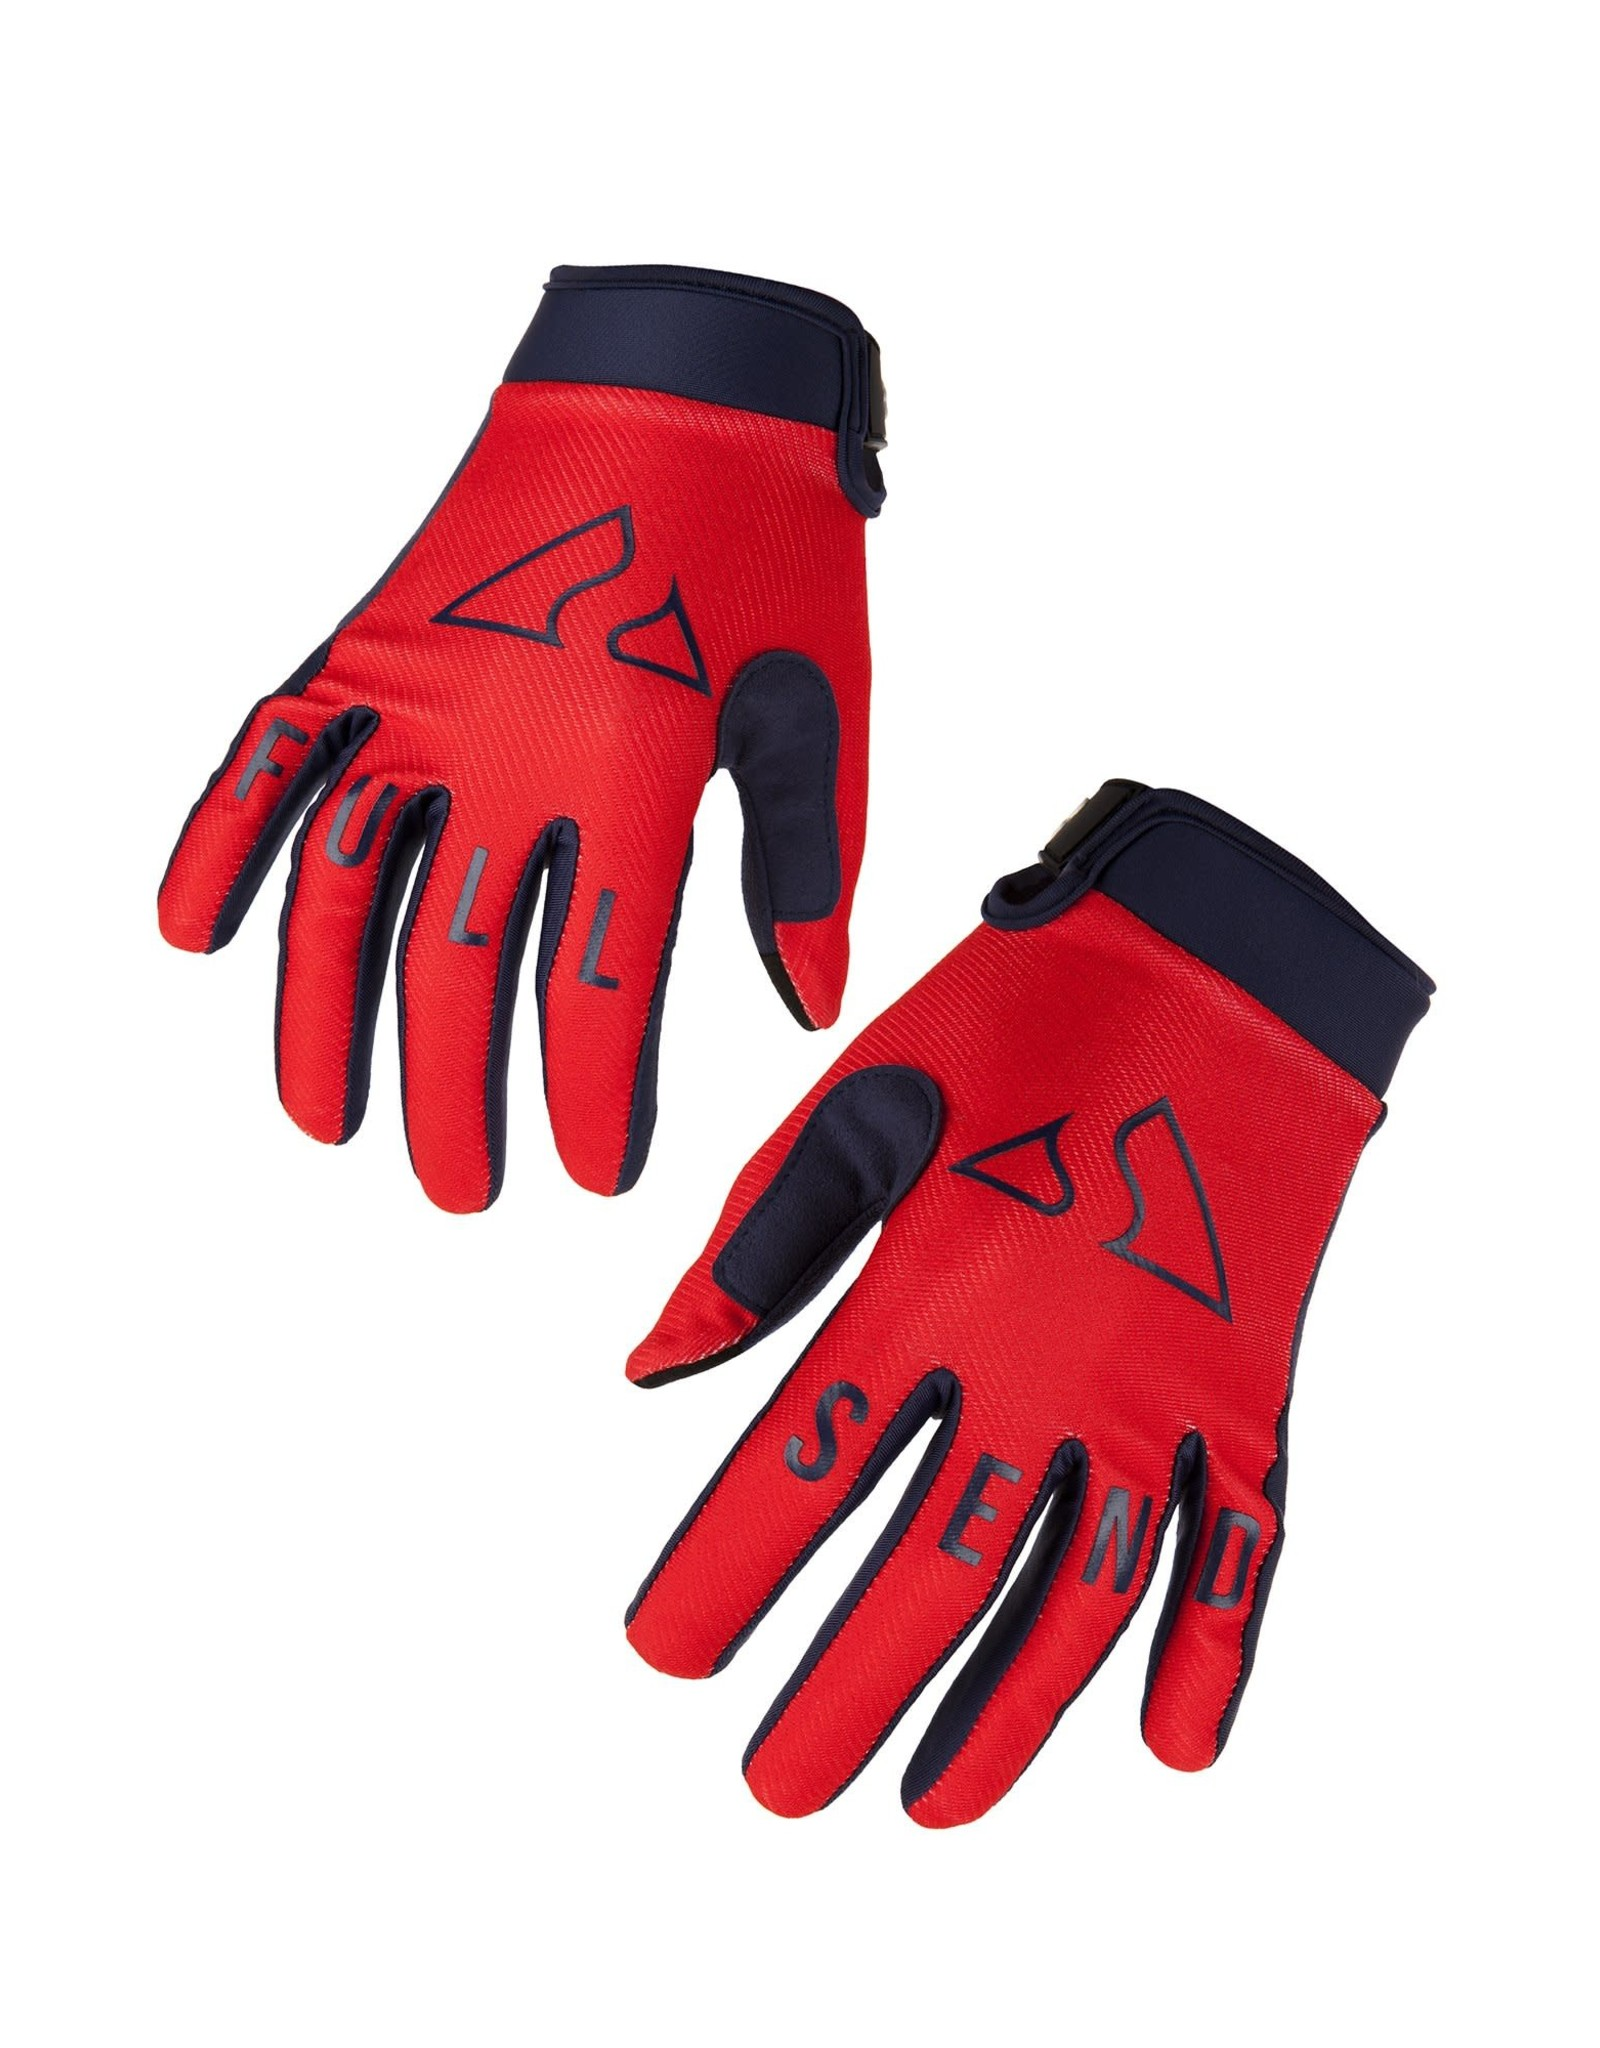 Sendy Full Neon Punch Glove